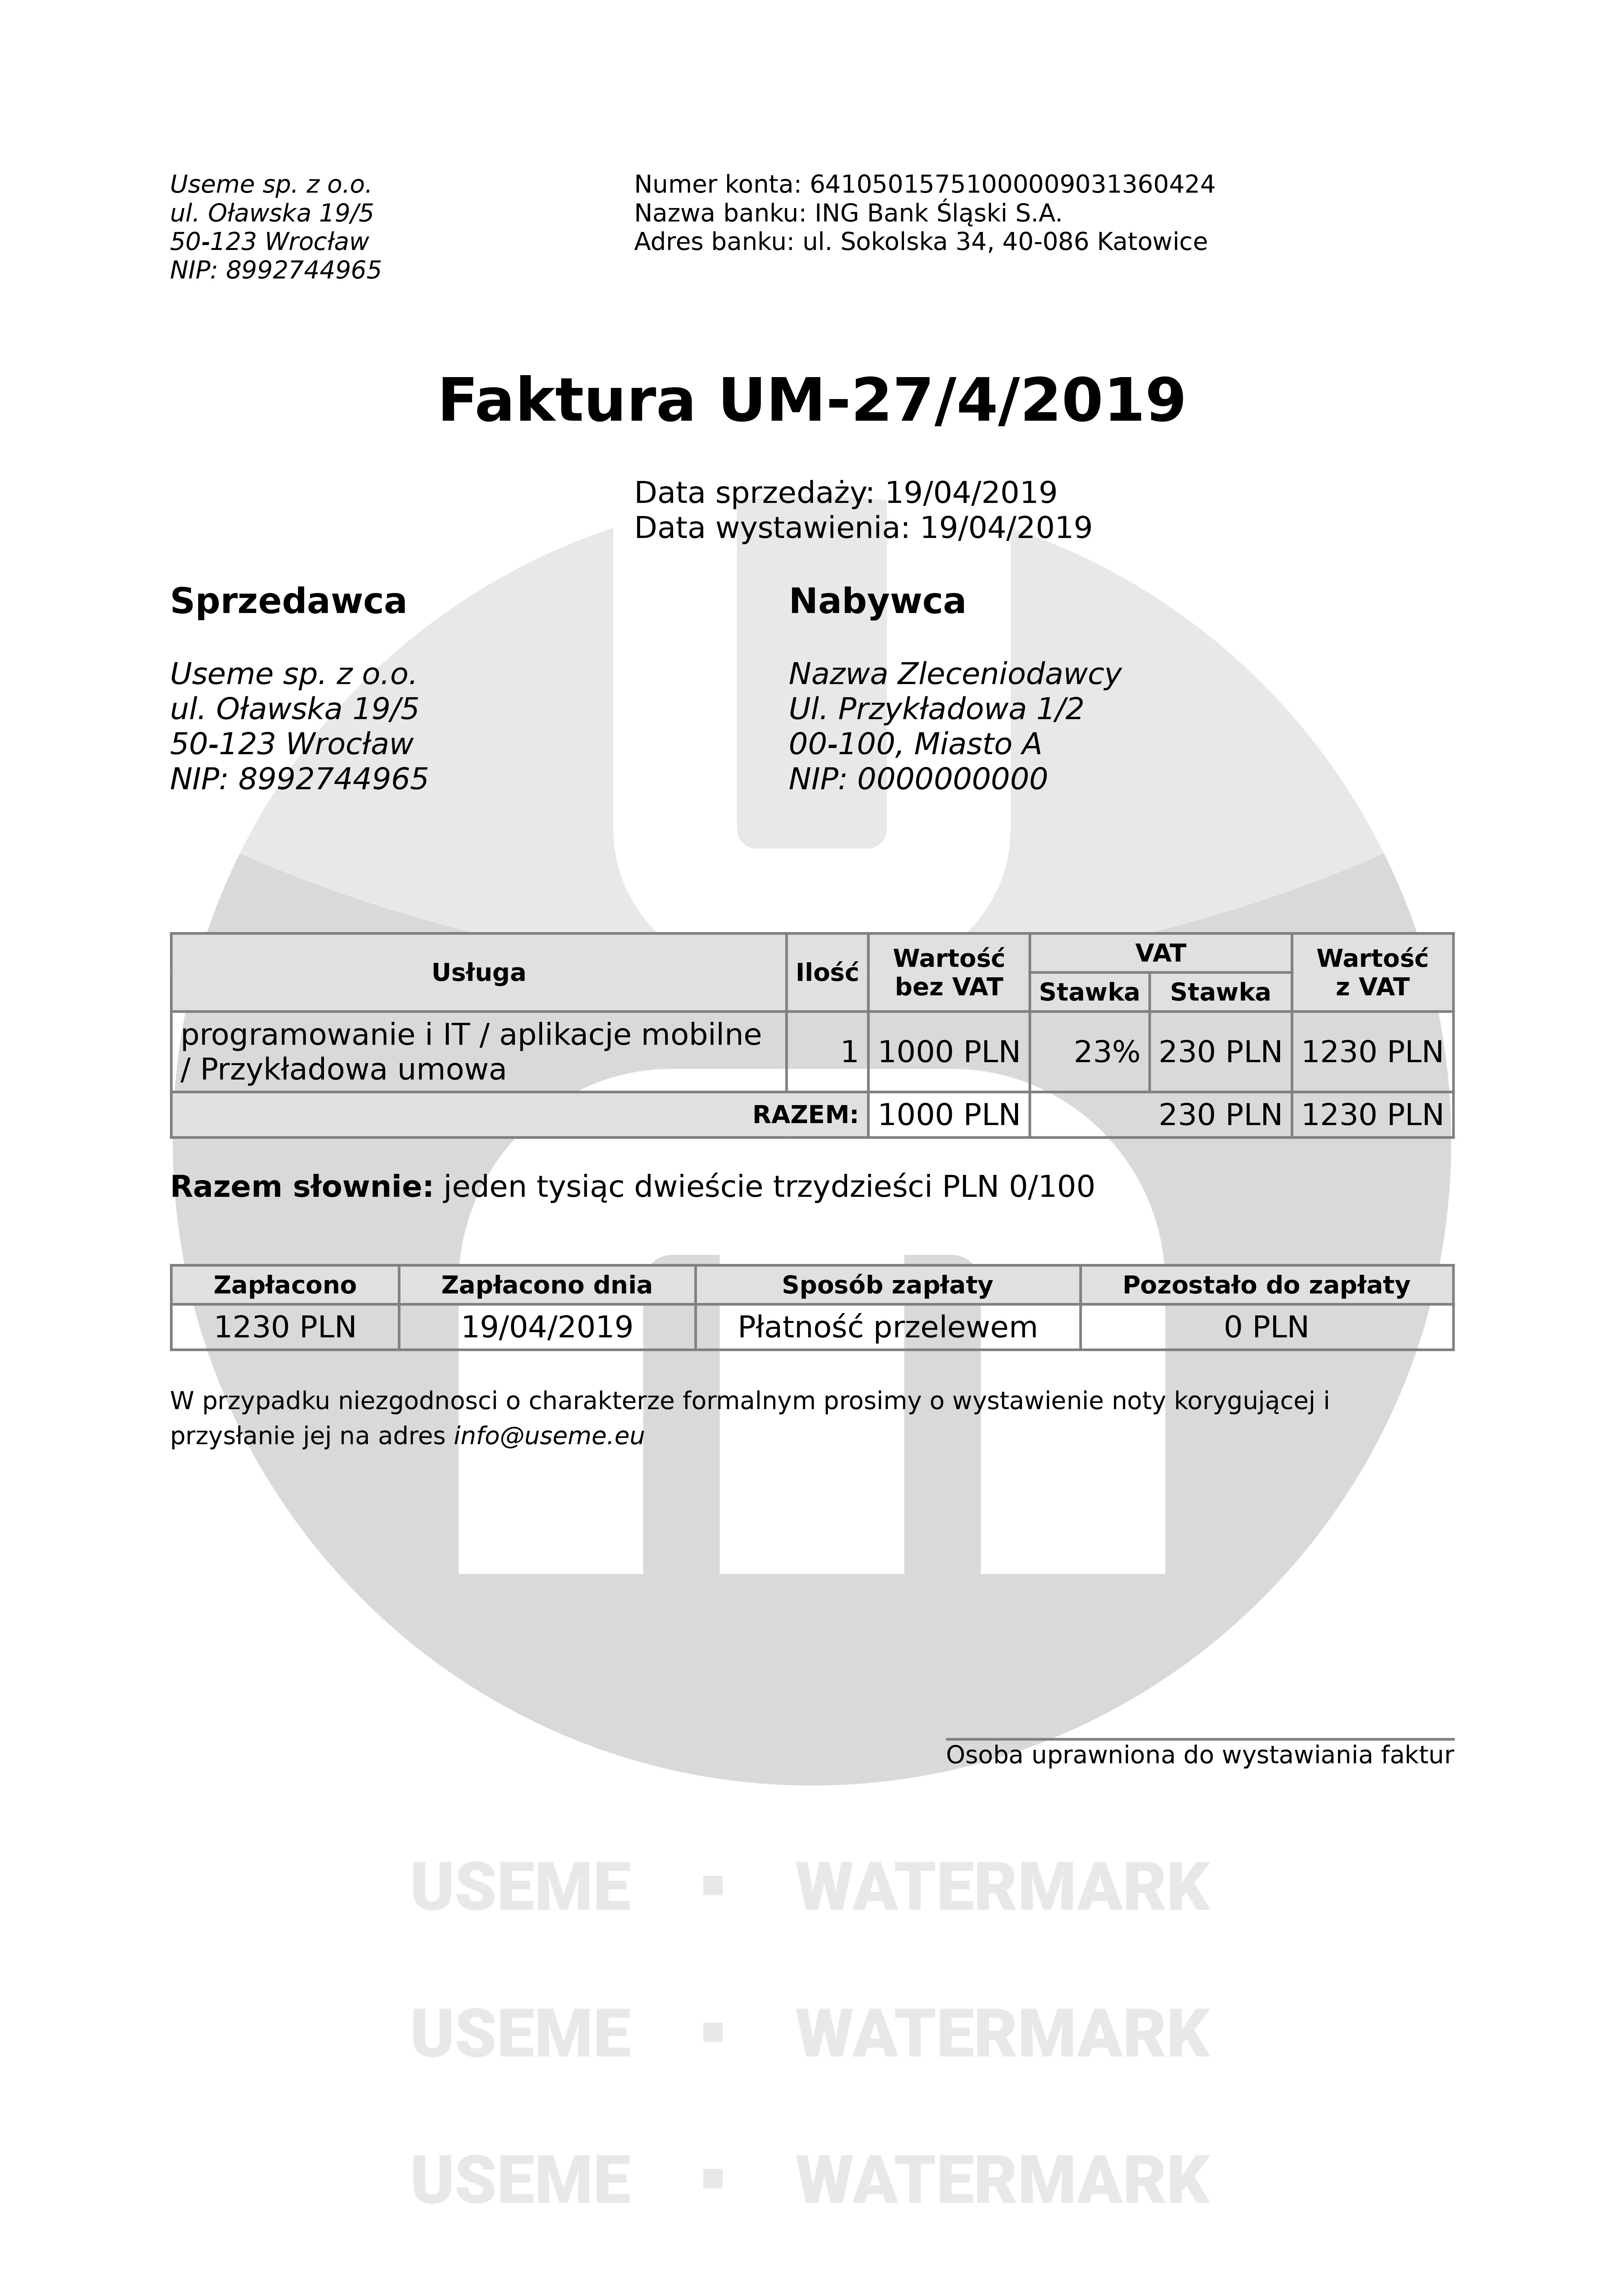 https://useme-prod-public.s3.amazonaws.com/help-images/invoice-UMBB2D6X_t.jpg